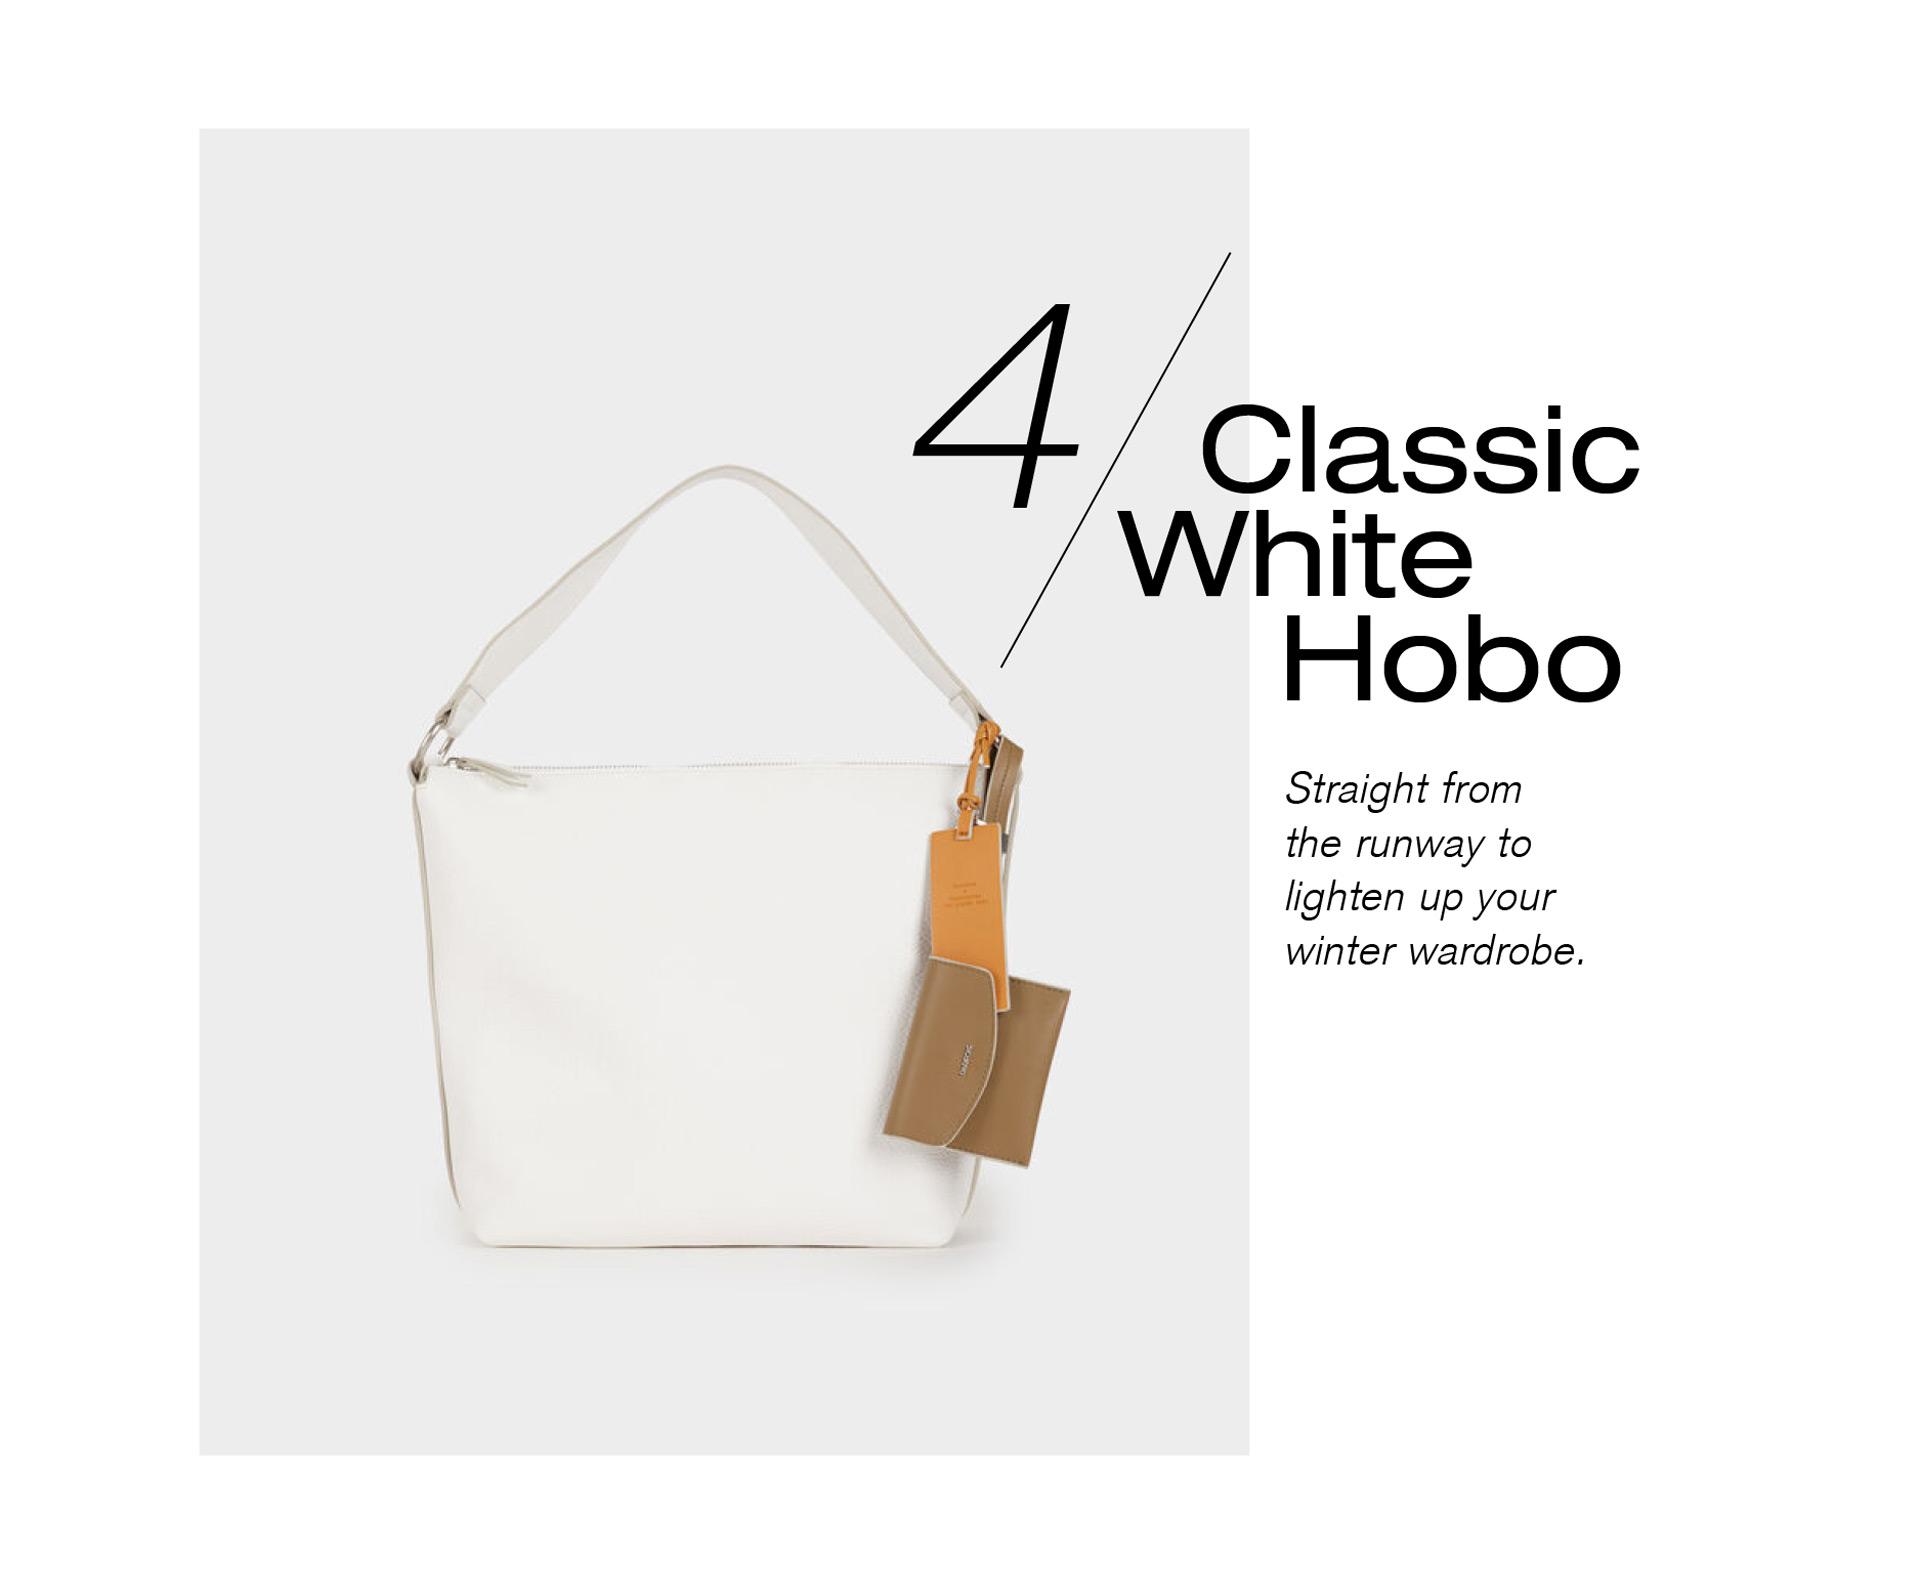 FTOP 10 BAGS